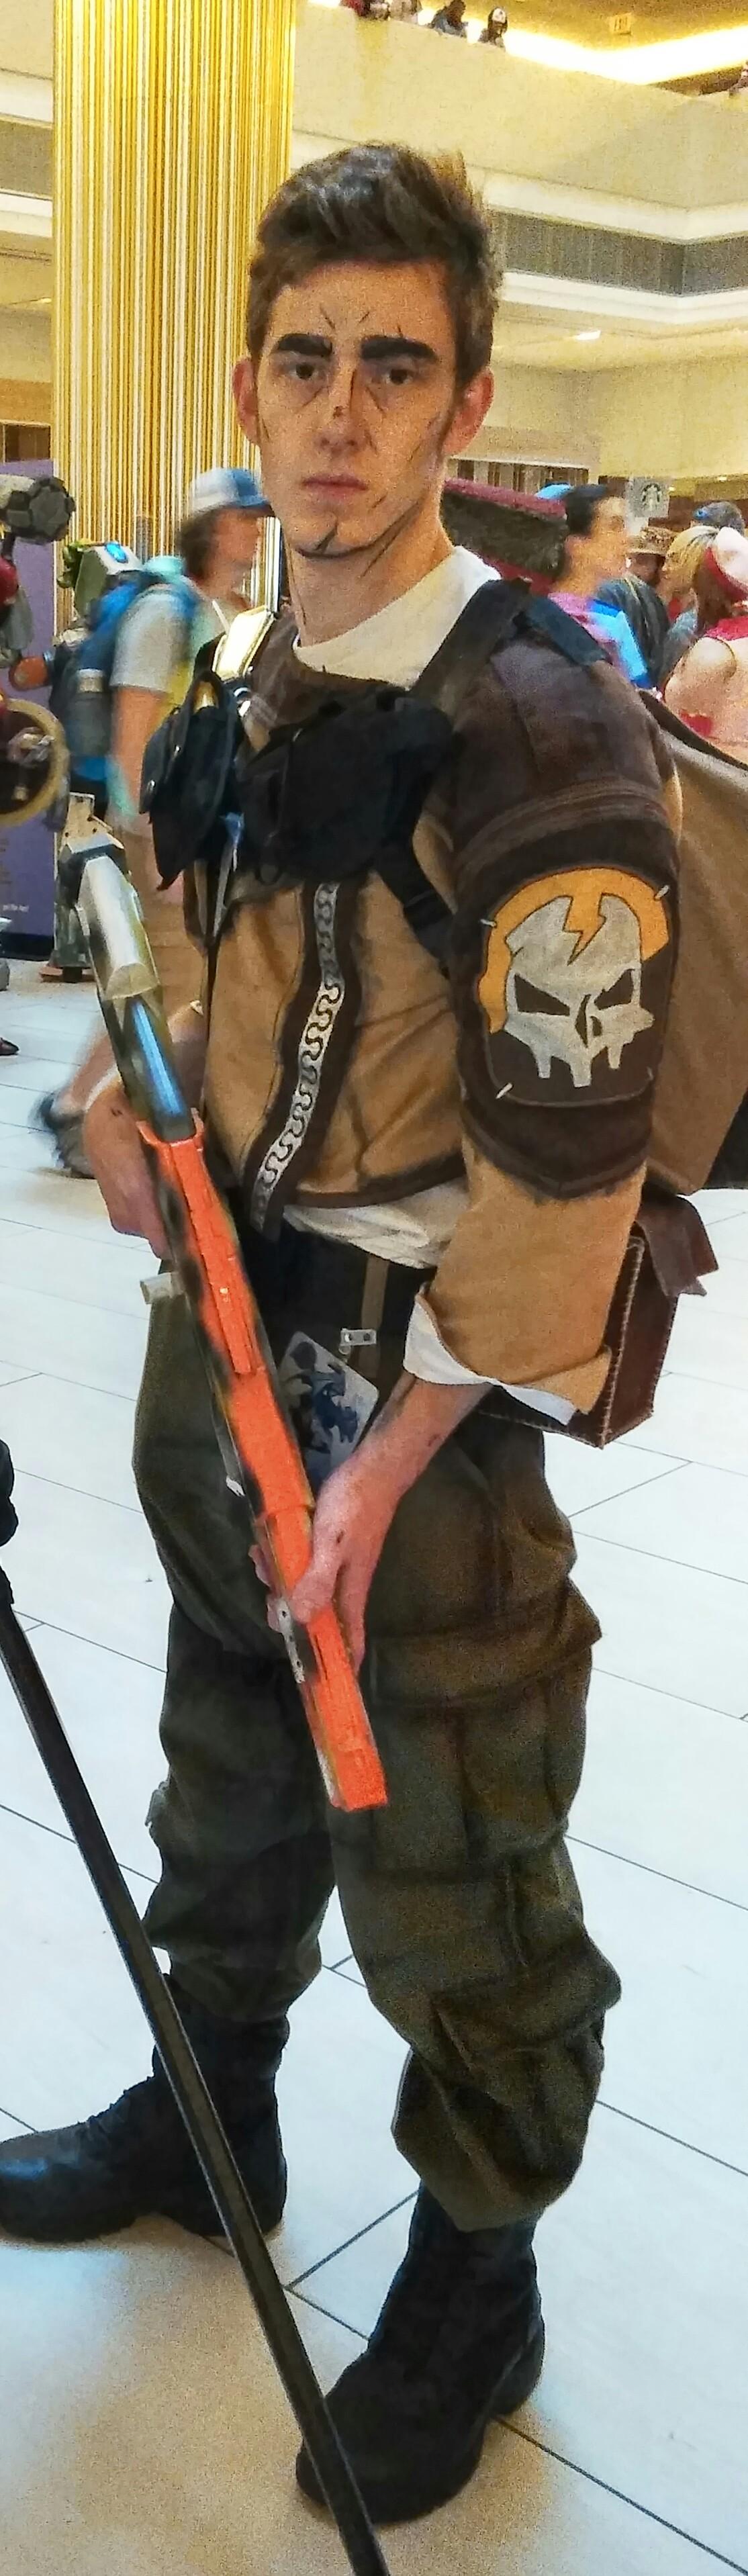 cosplay axton Borderlands 2